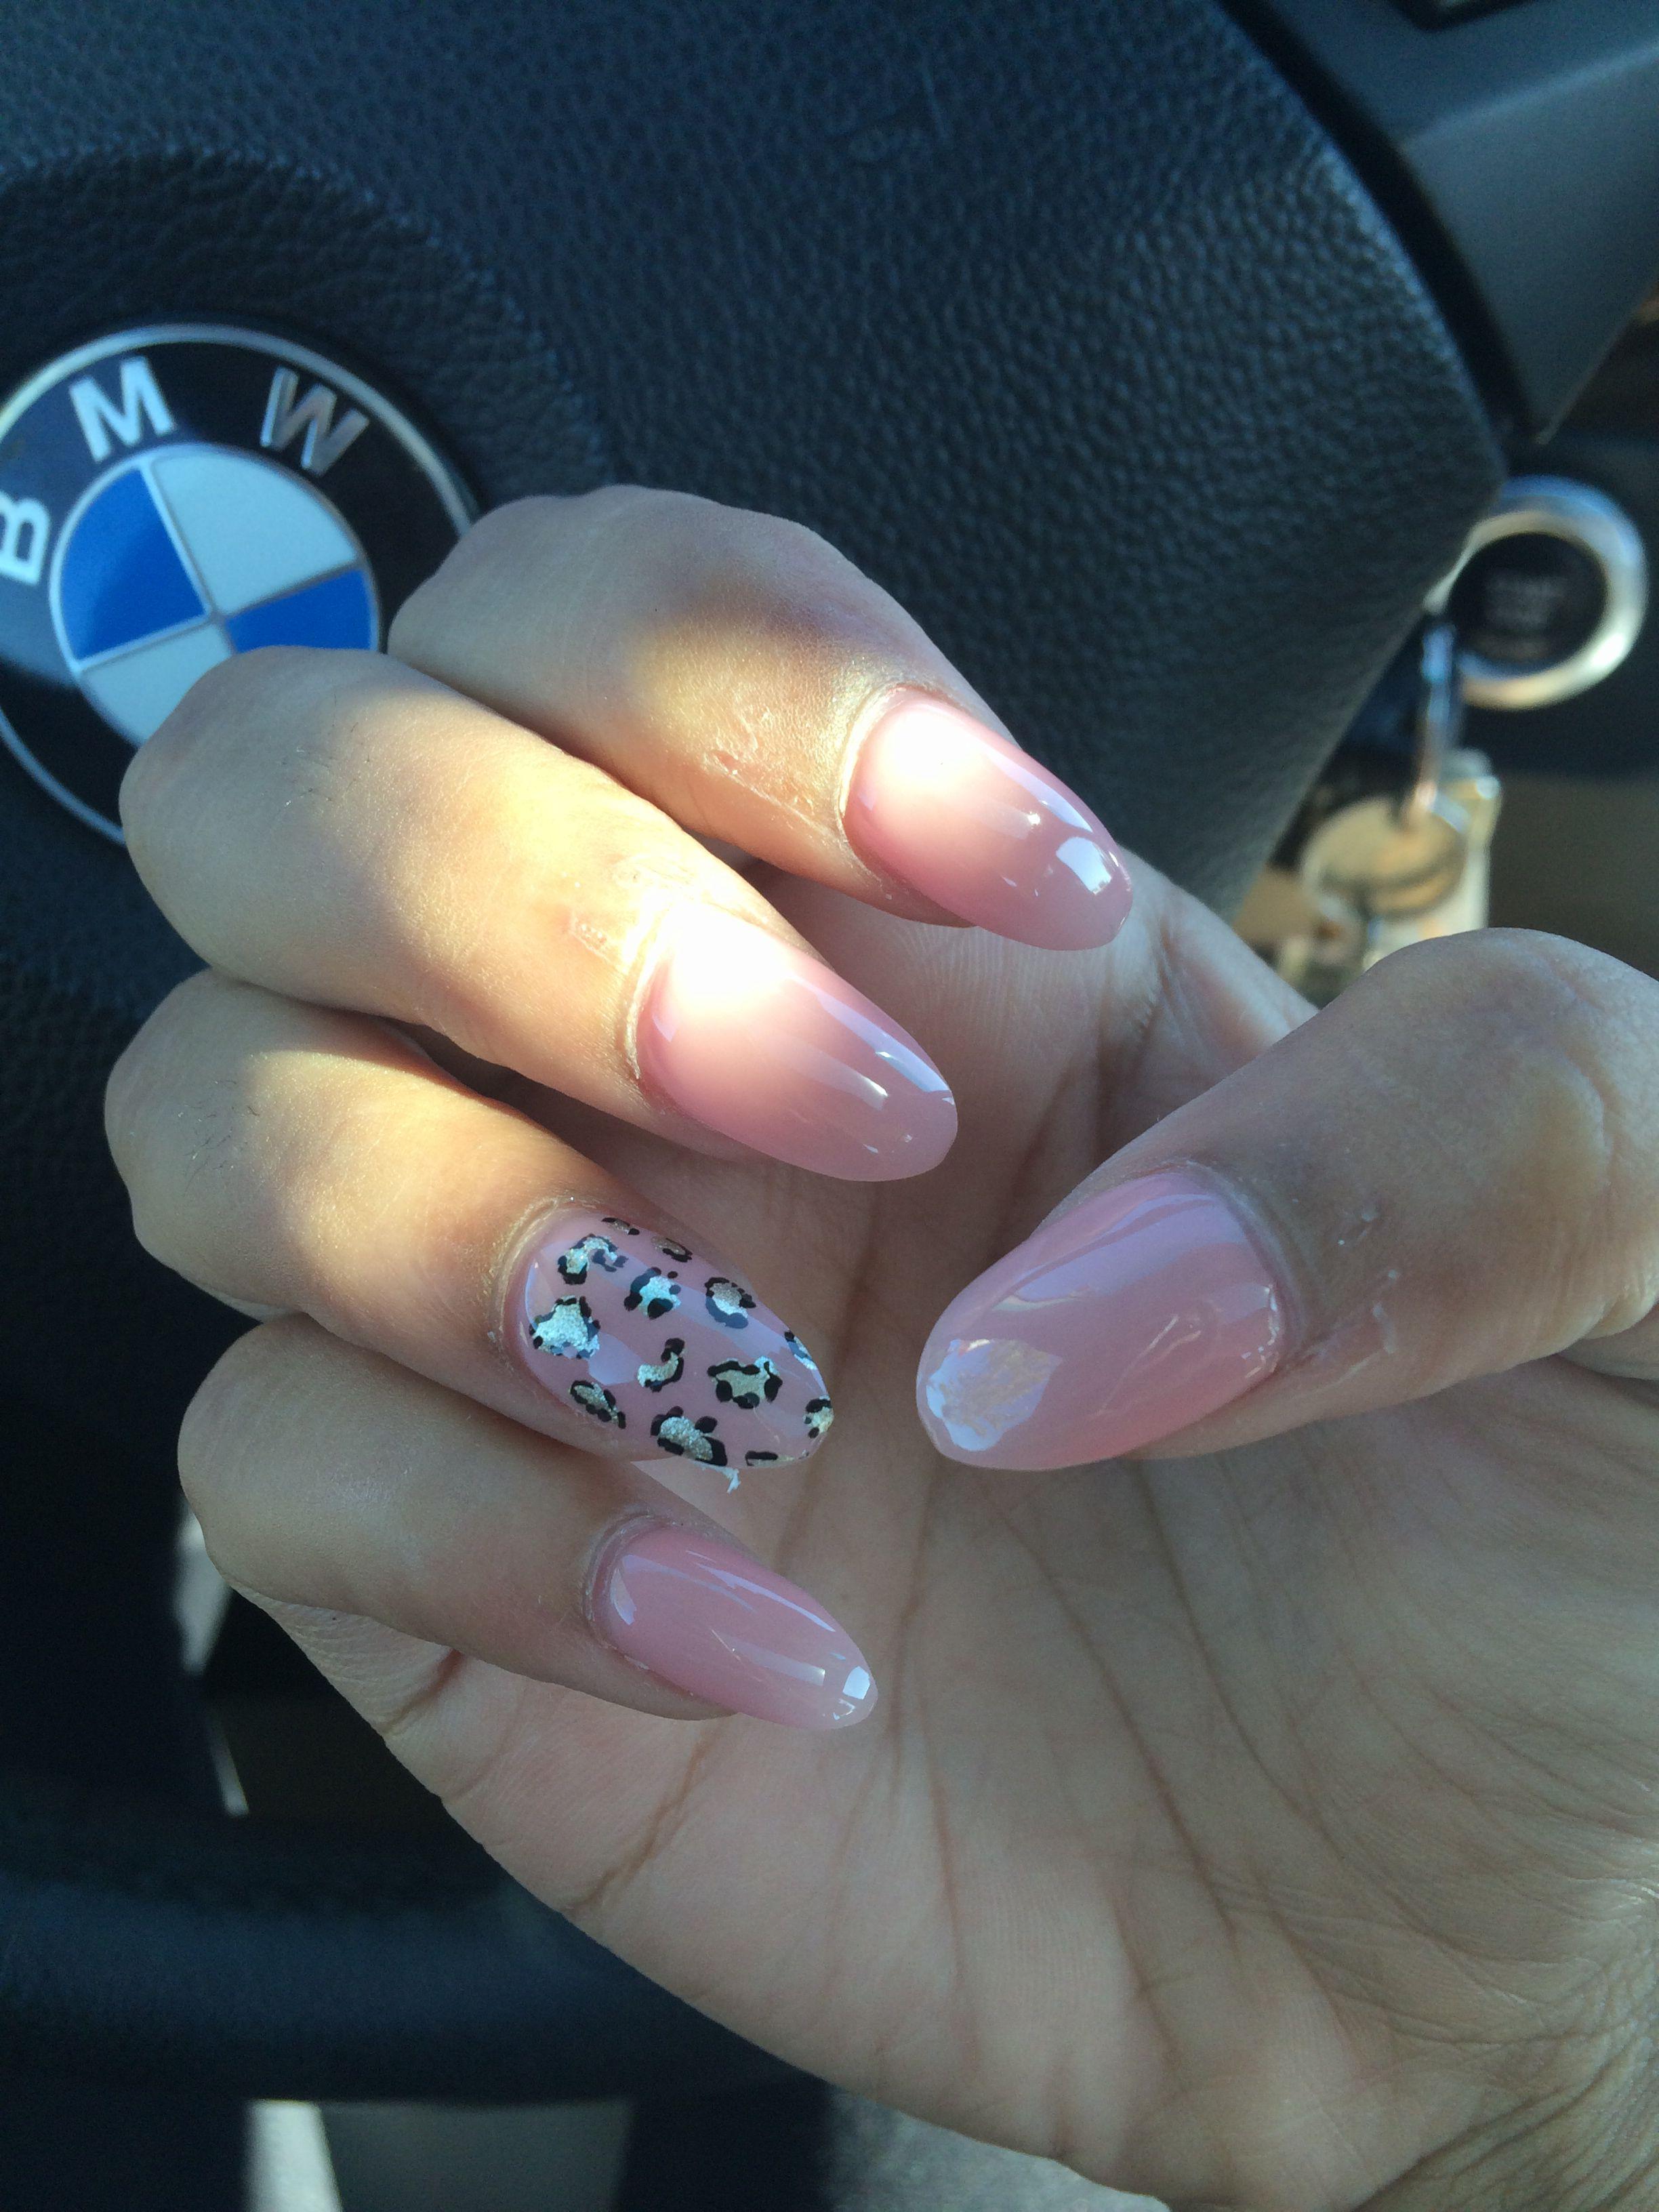 Stiletto nails with Cheetah print